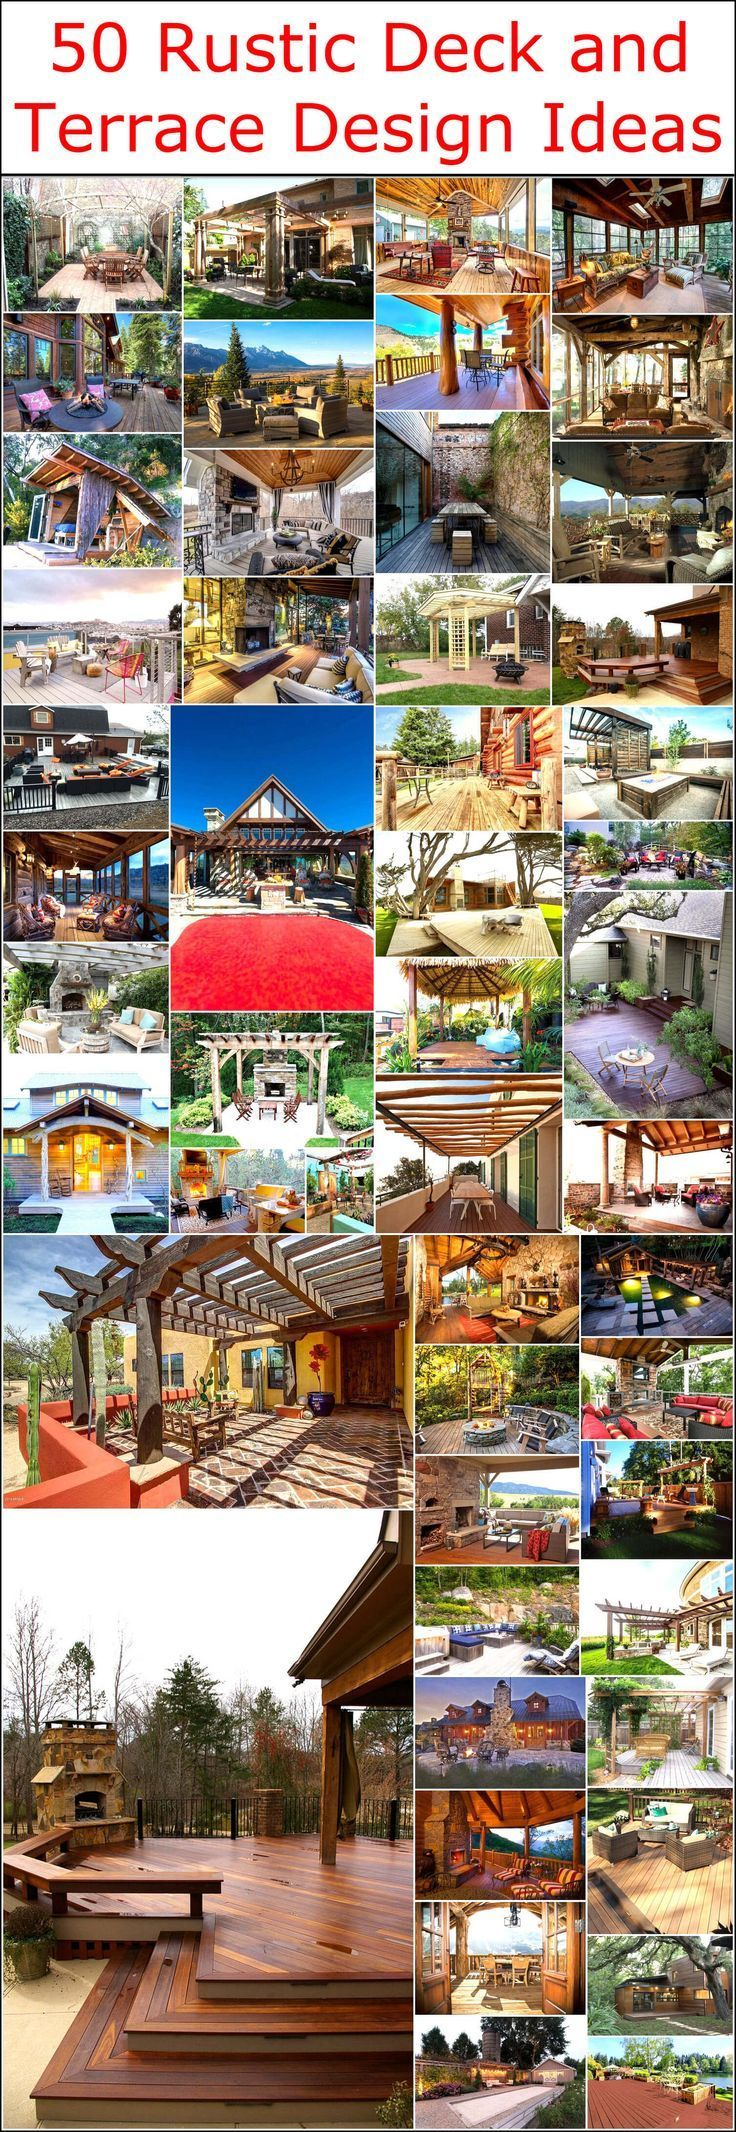 rustikale Deck und Terrasse Design-Ideen   - We Heart Rustic-#balkoni